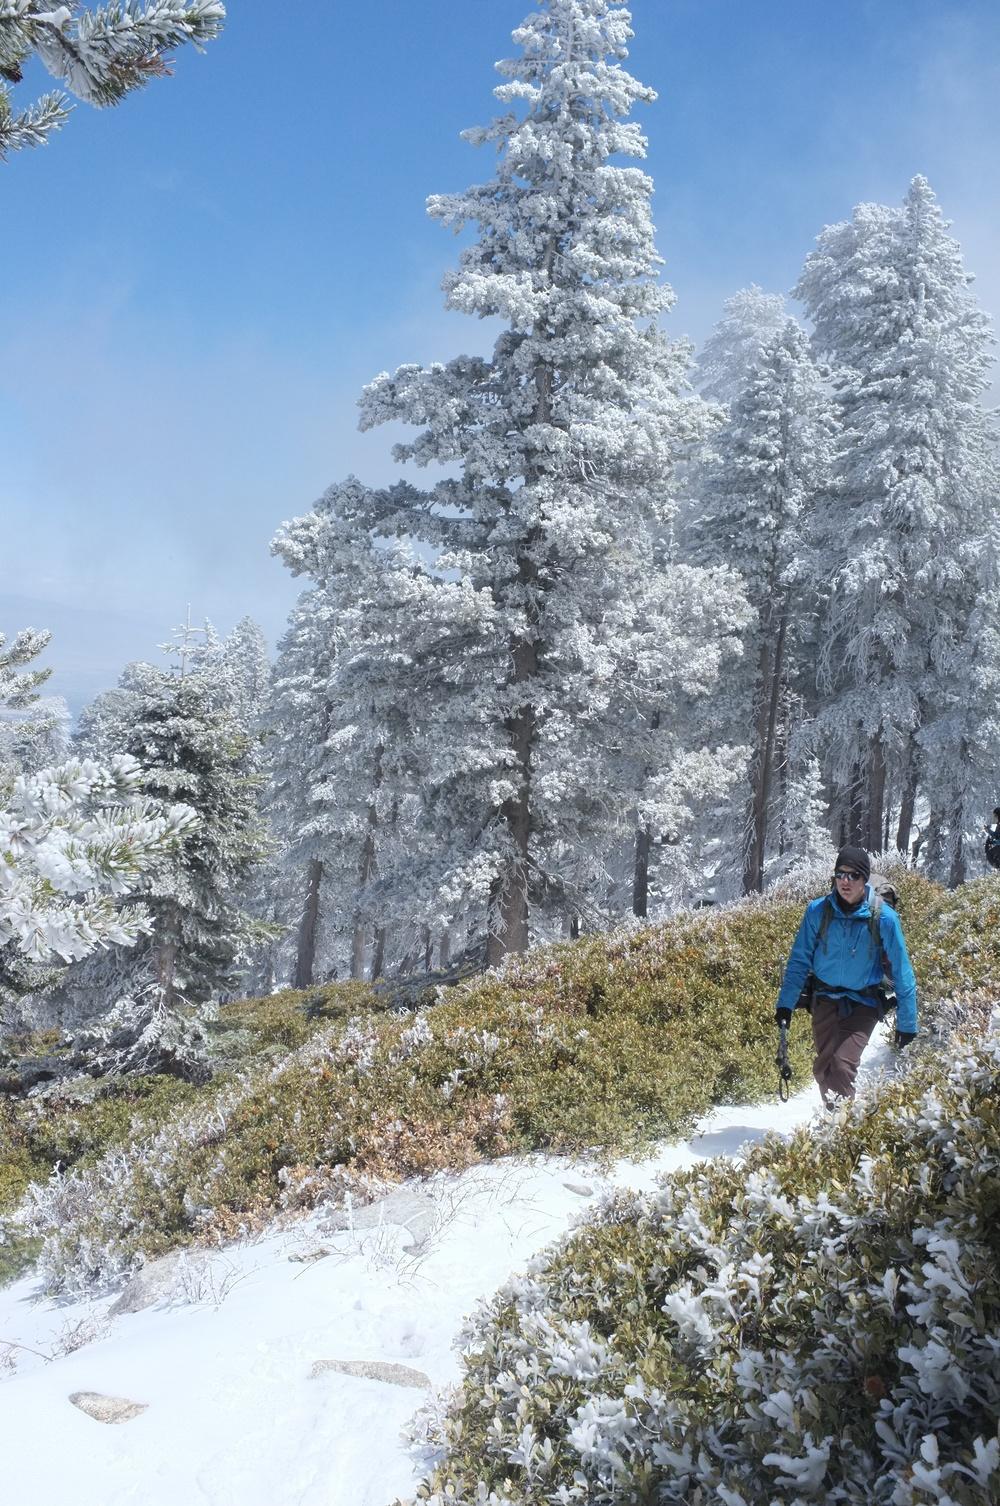 Jonathan hiking through the fresh snow.